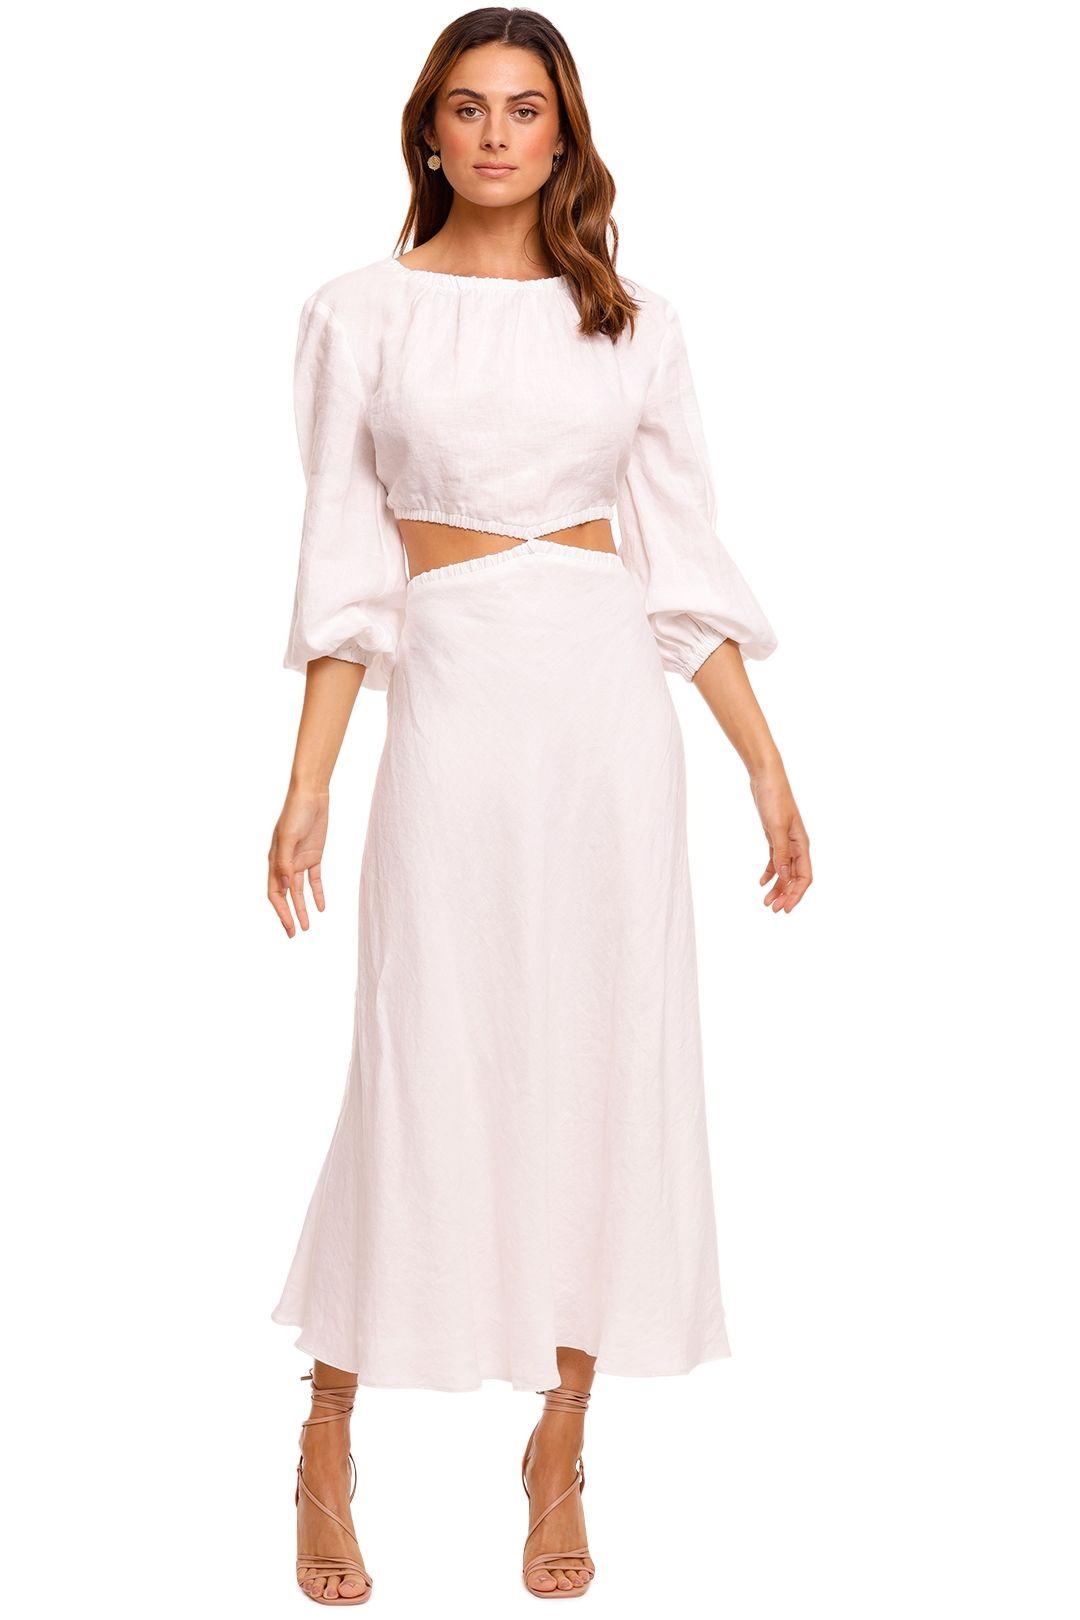 Bec and Bridge Madeleine Ivory midi dress